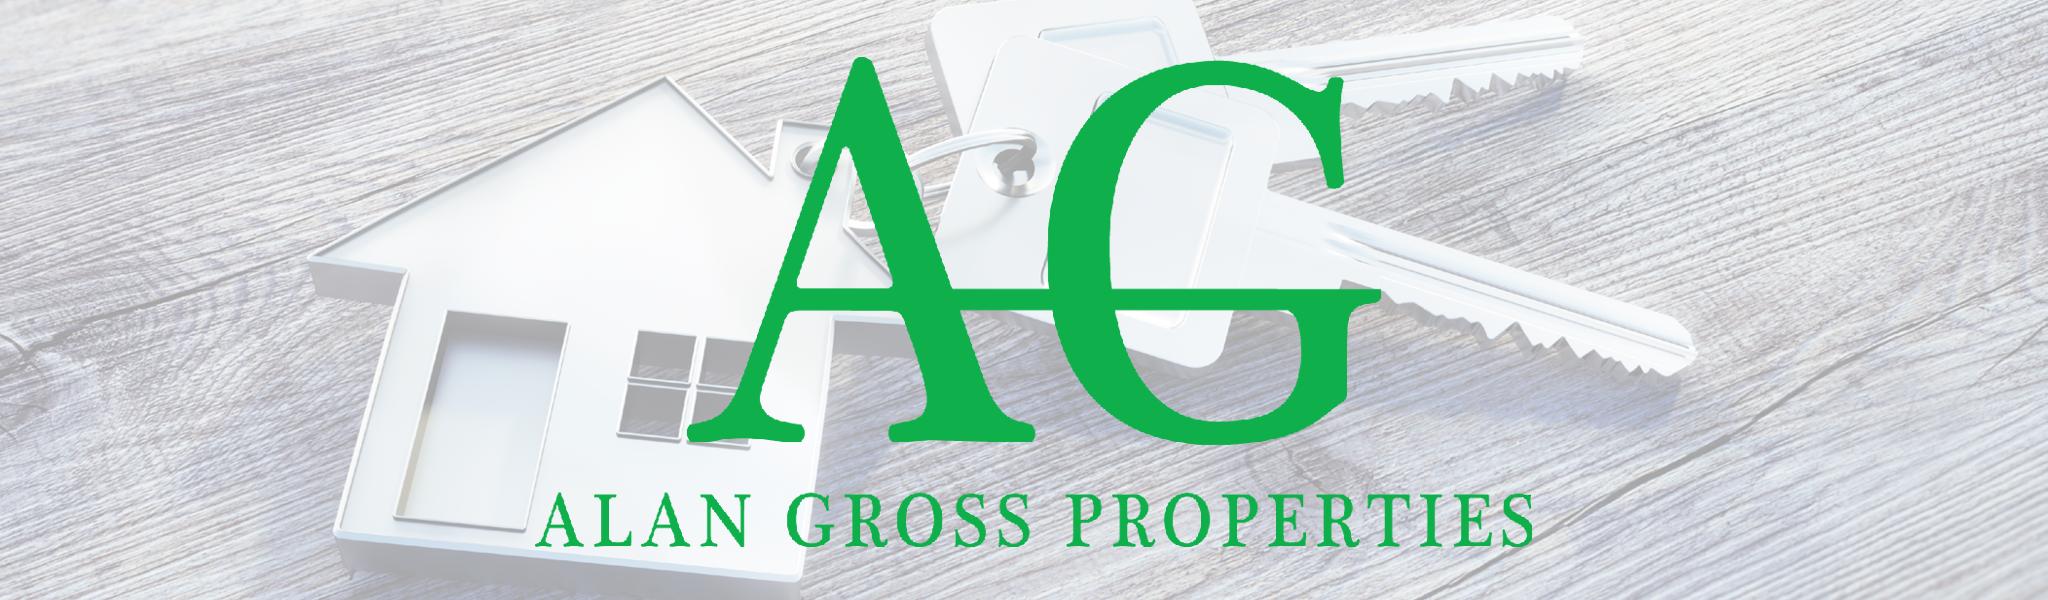 alan gross properties page